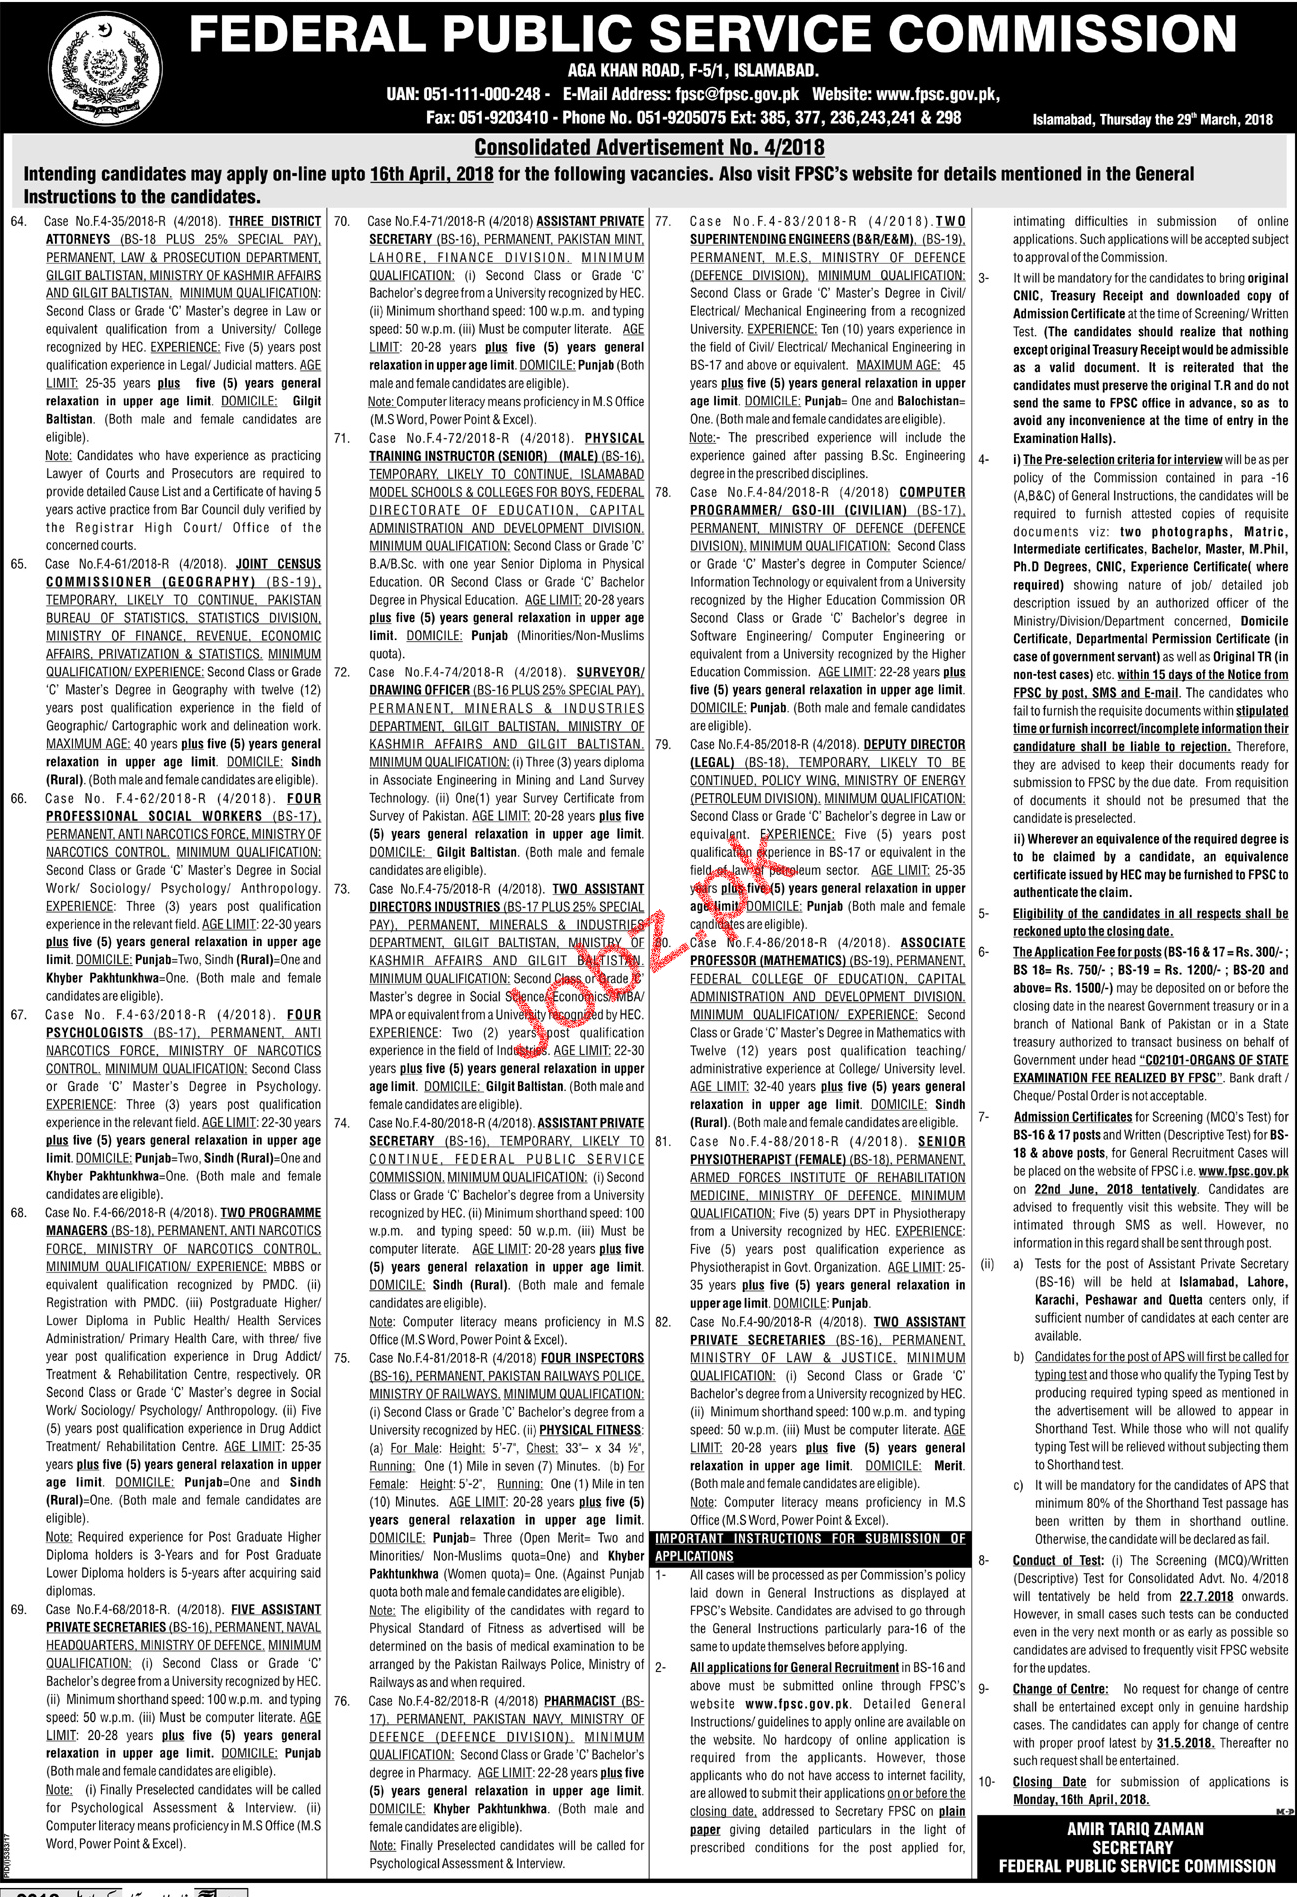 Federal Public Service Commission FPSC Jobs Open